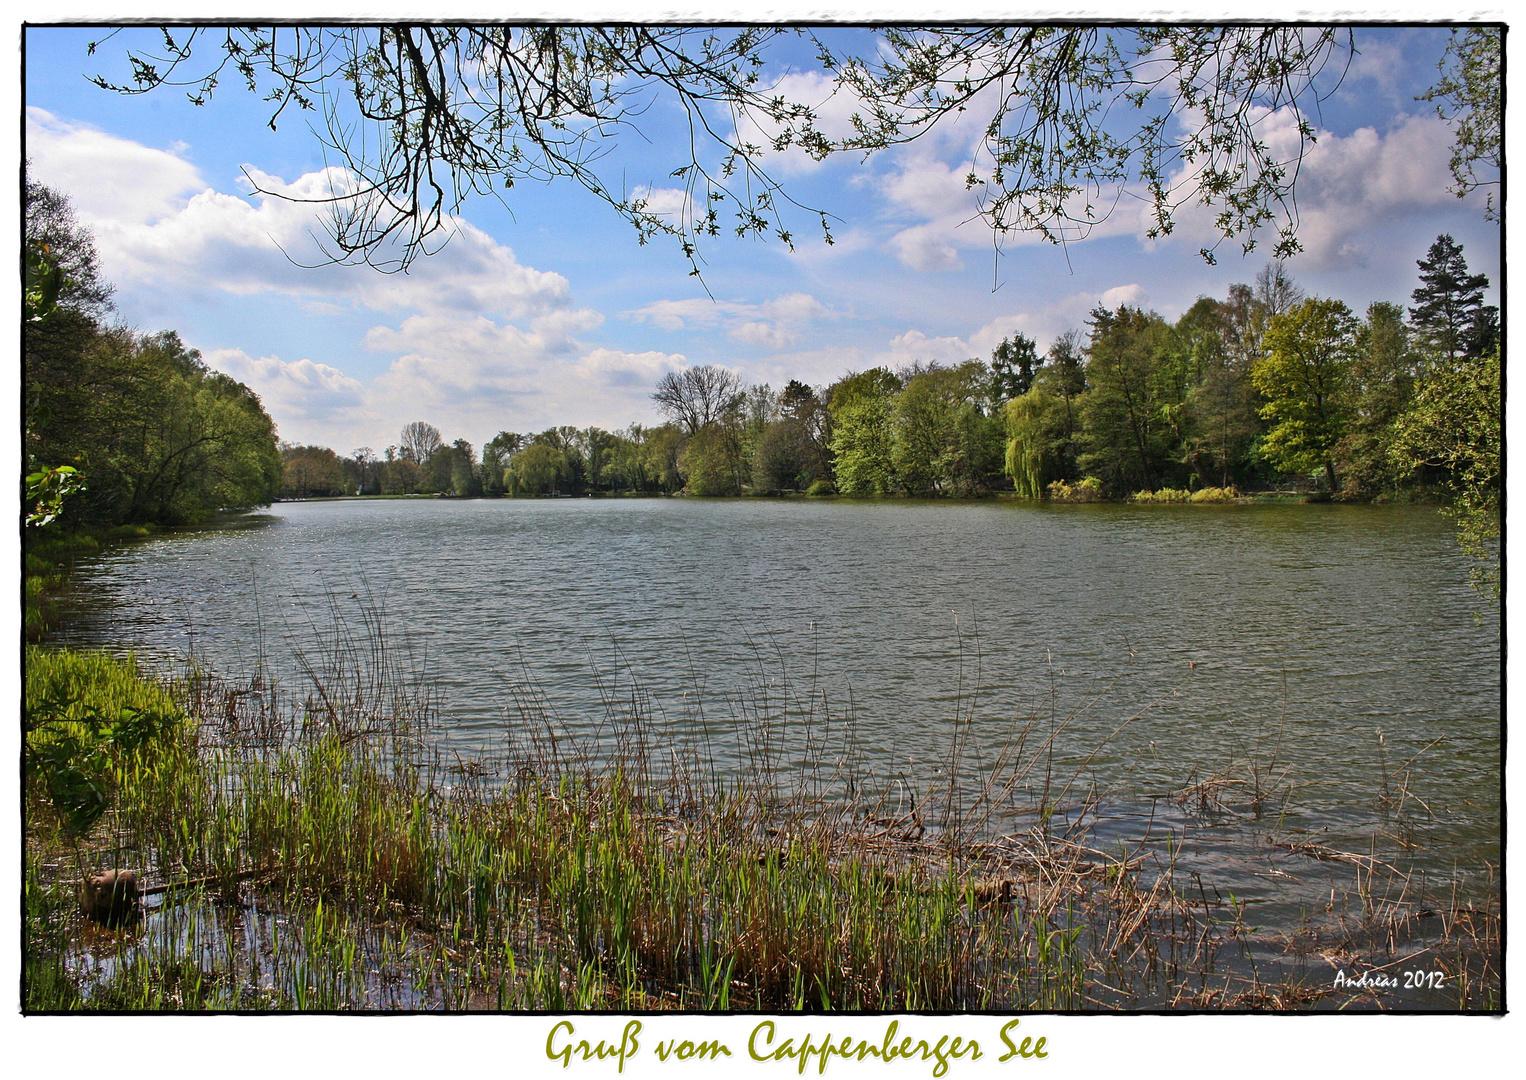 Gruss vom Cappenberger See